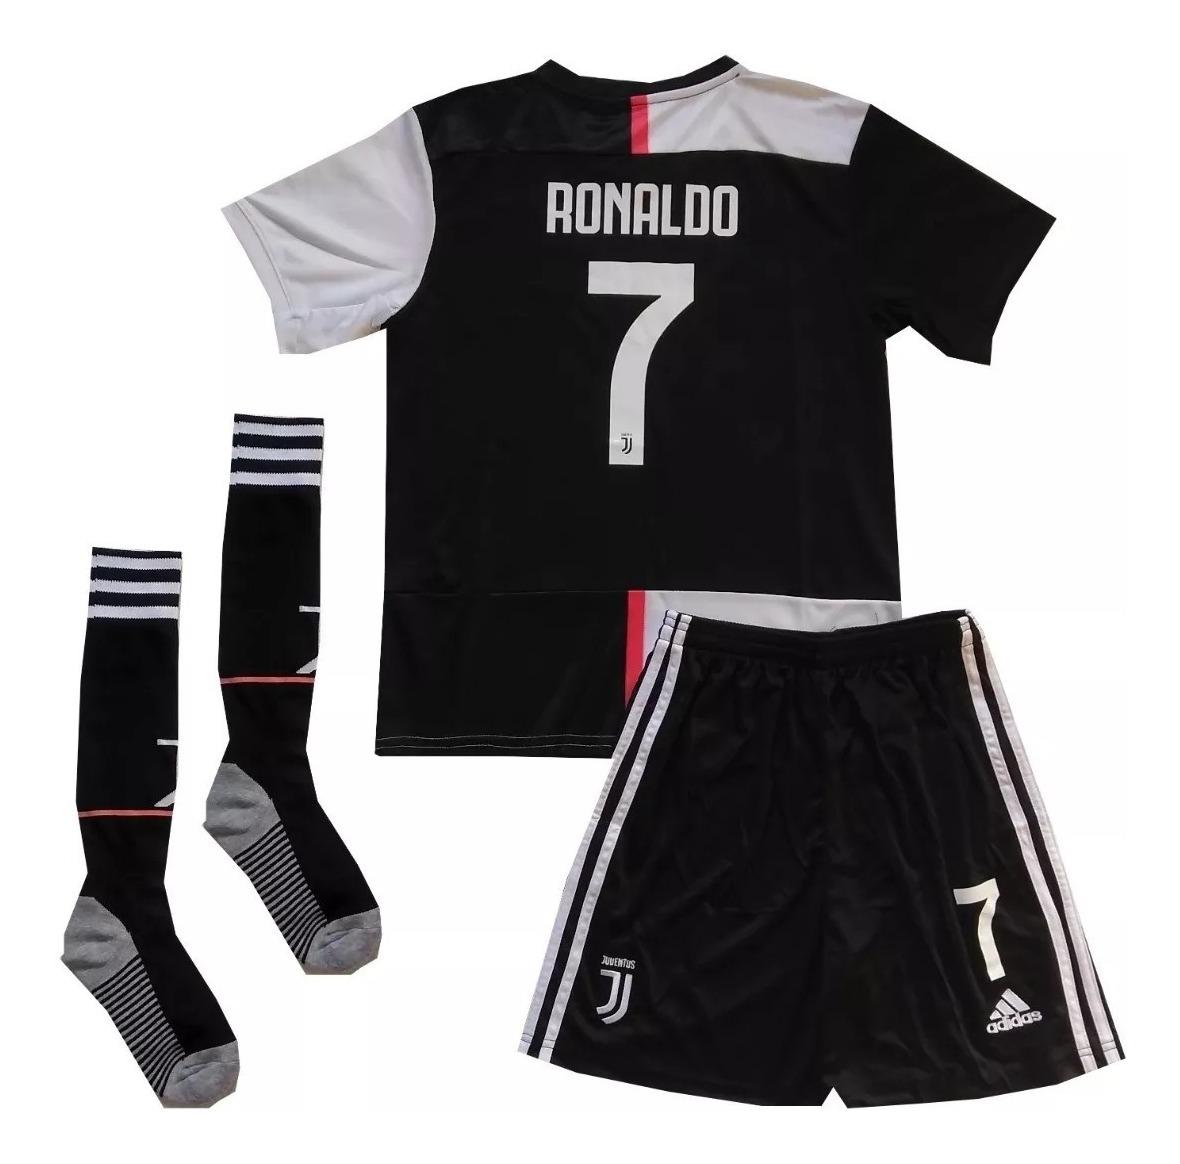 reputable site fbe79 bf015 Kit Infantil Juventus 2019 2020 Meião Cr7 Ronaldo 7 Dybala